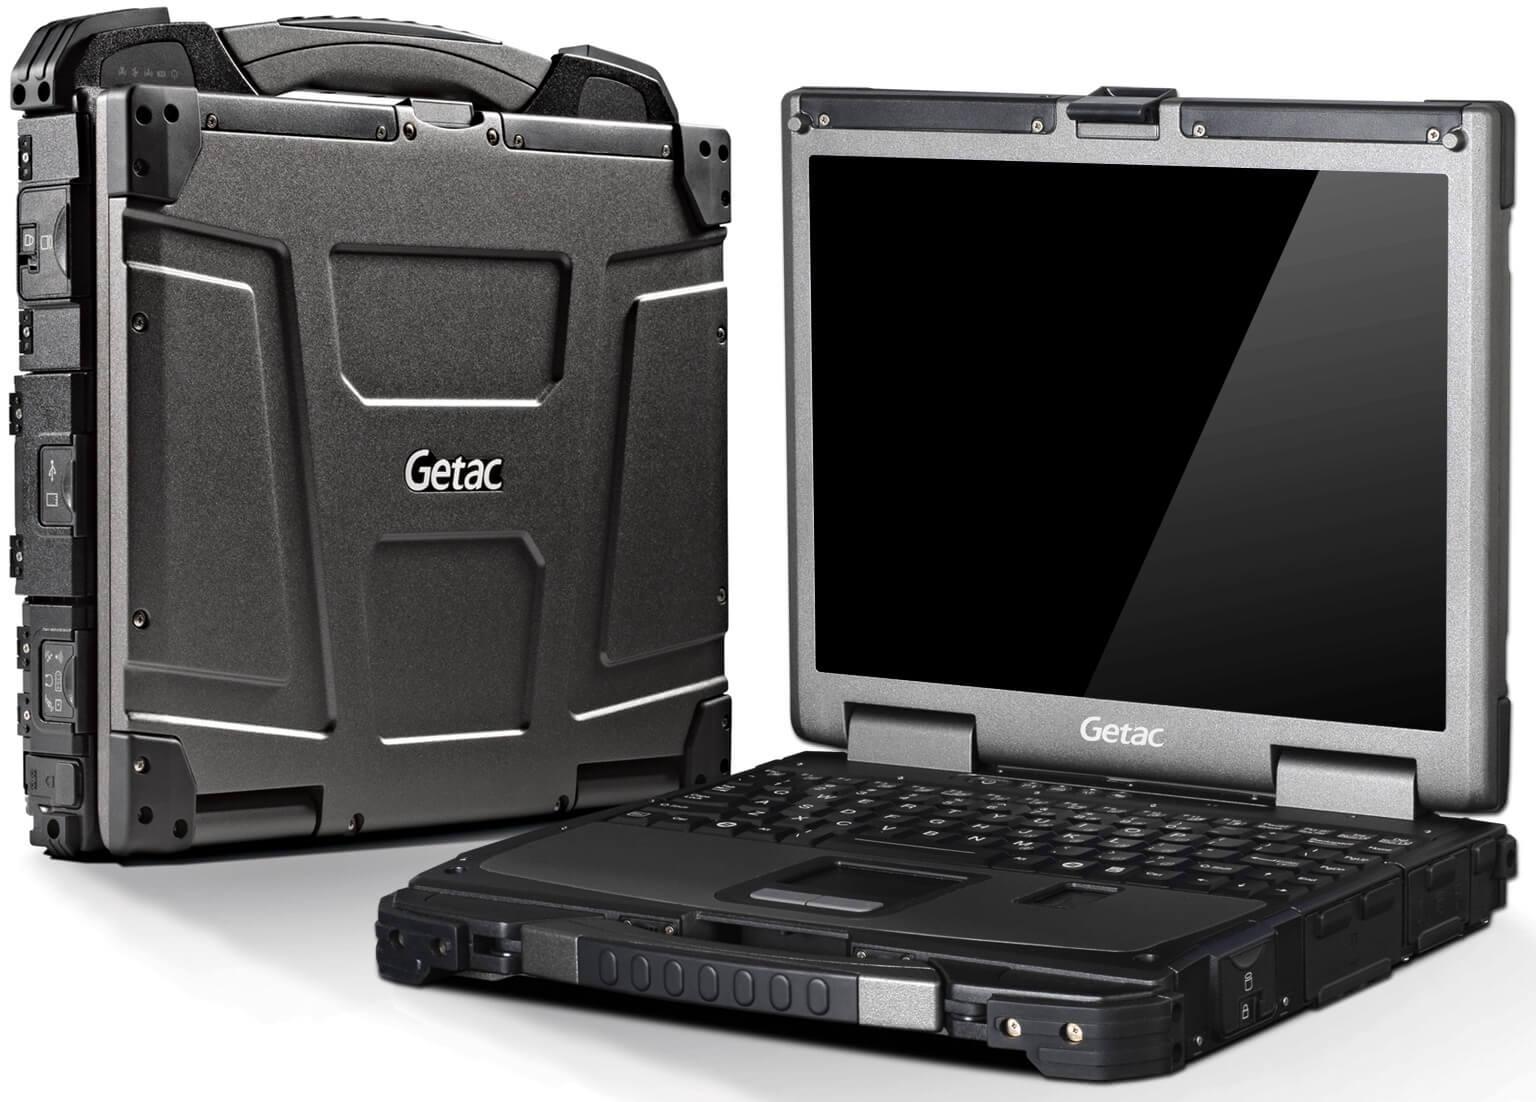 "GETAC - Getac B300 Premium 13.3"" i5-6200U/4GB/500GB/W10P"